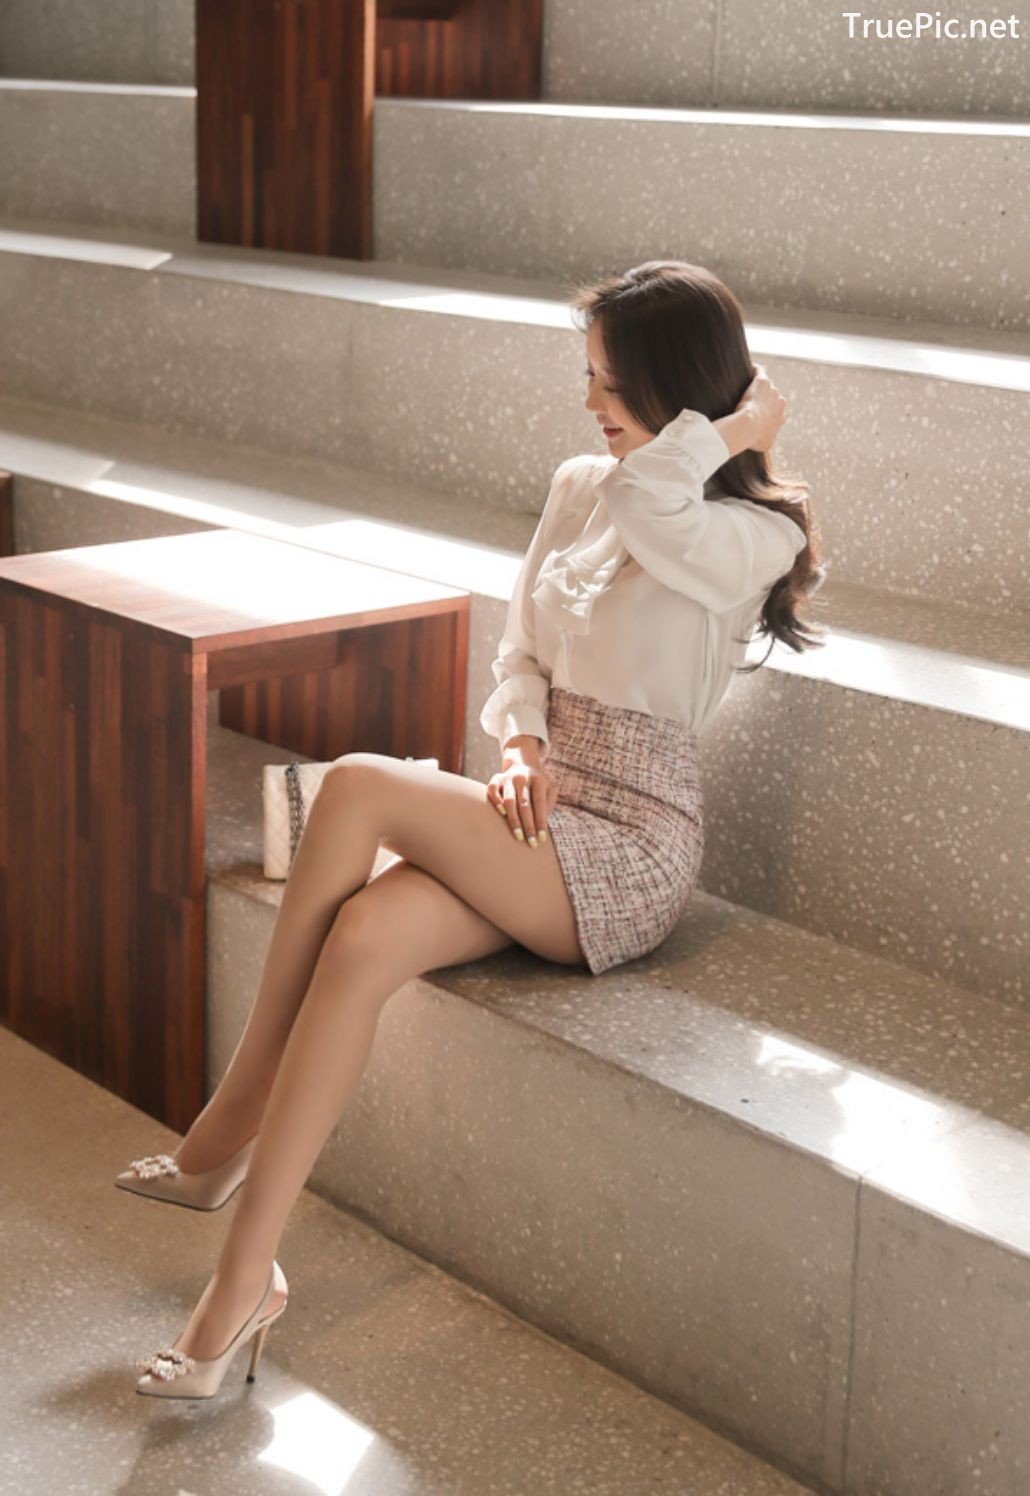 Image-Hot-Korean-Fashion-Model-Son-Yoon-Joo-She-So-Lovely-With-Miniskirt-TruePic.net- Picture-2